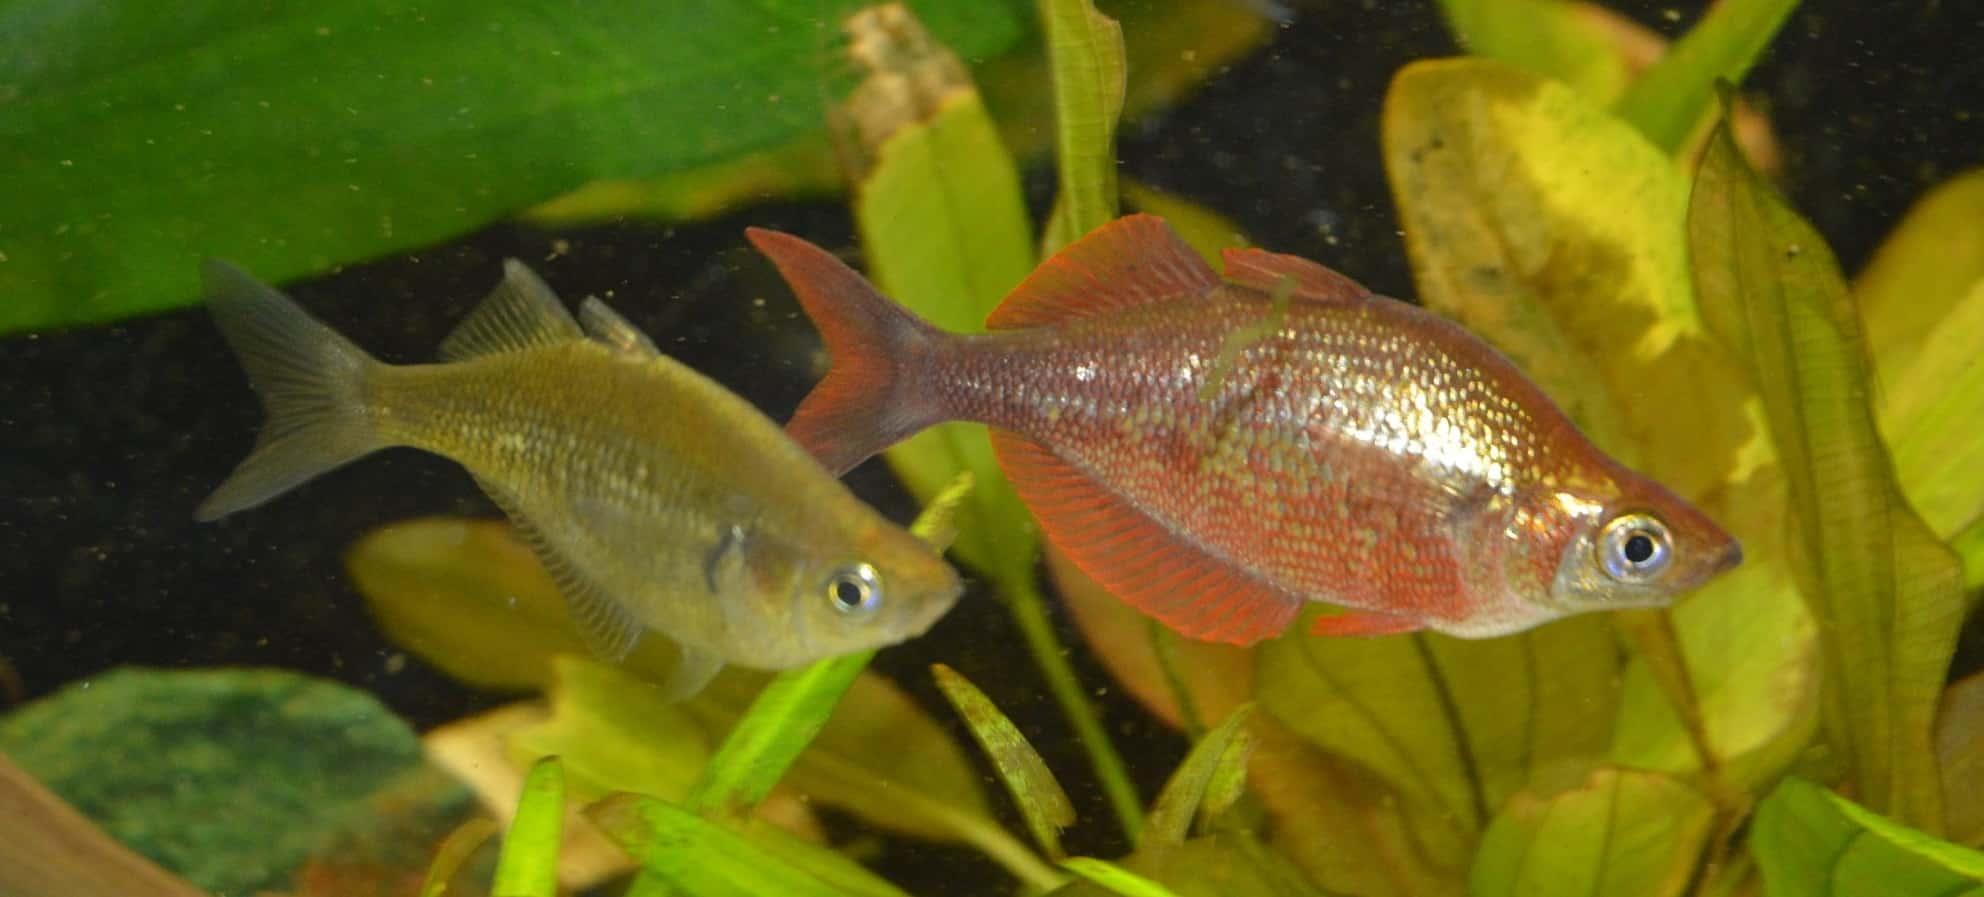 Lachsroter Regenbogenfisch Pärchen